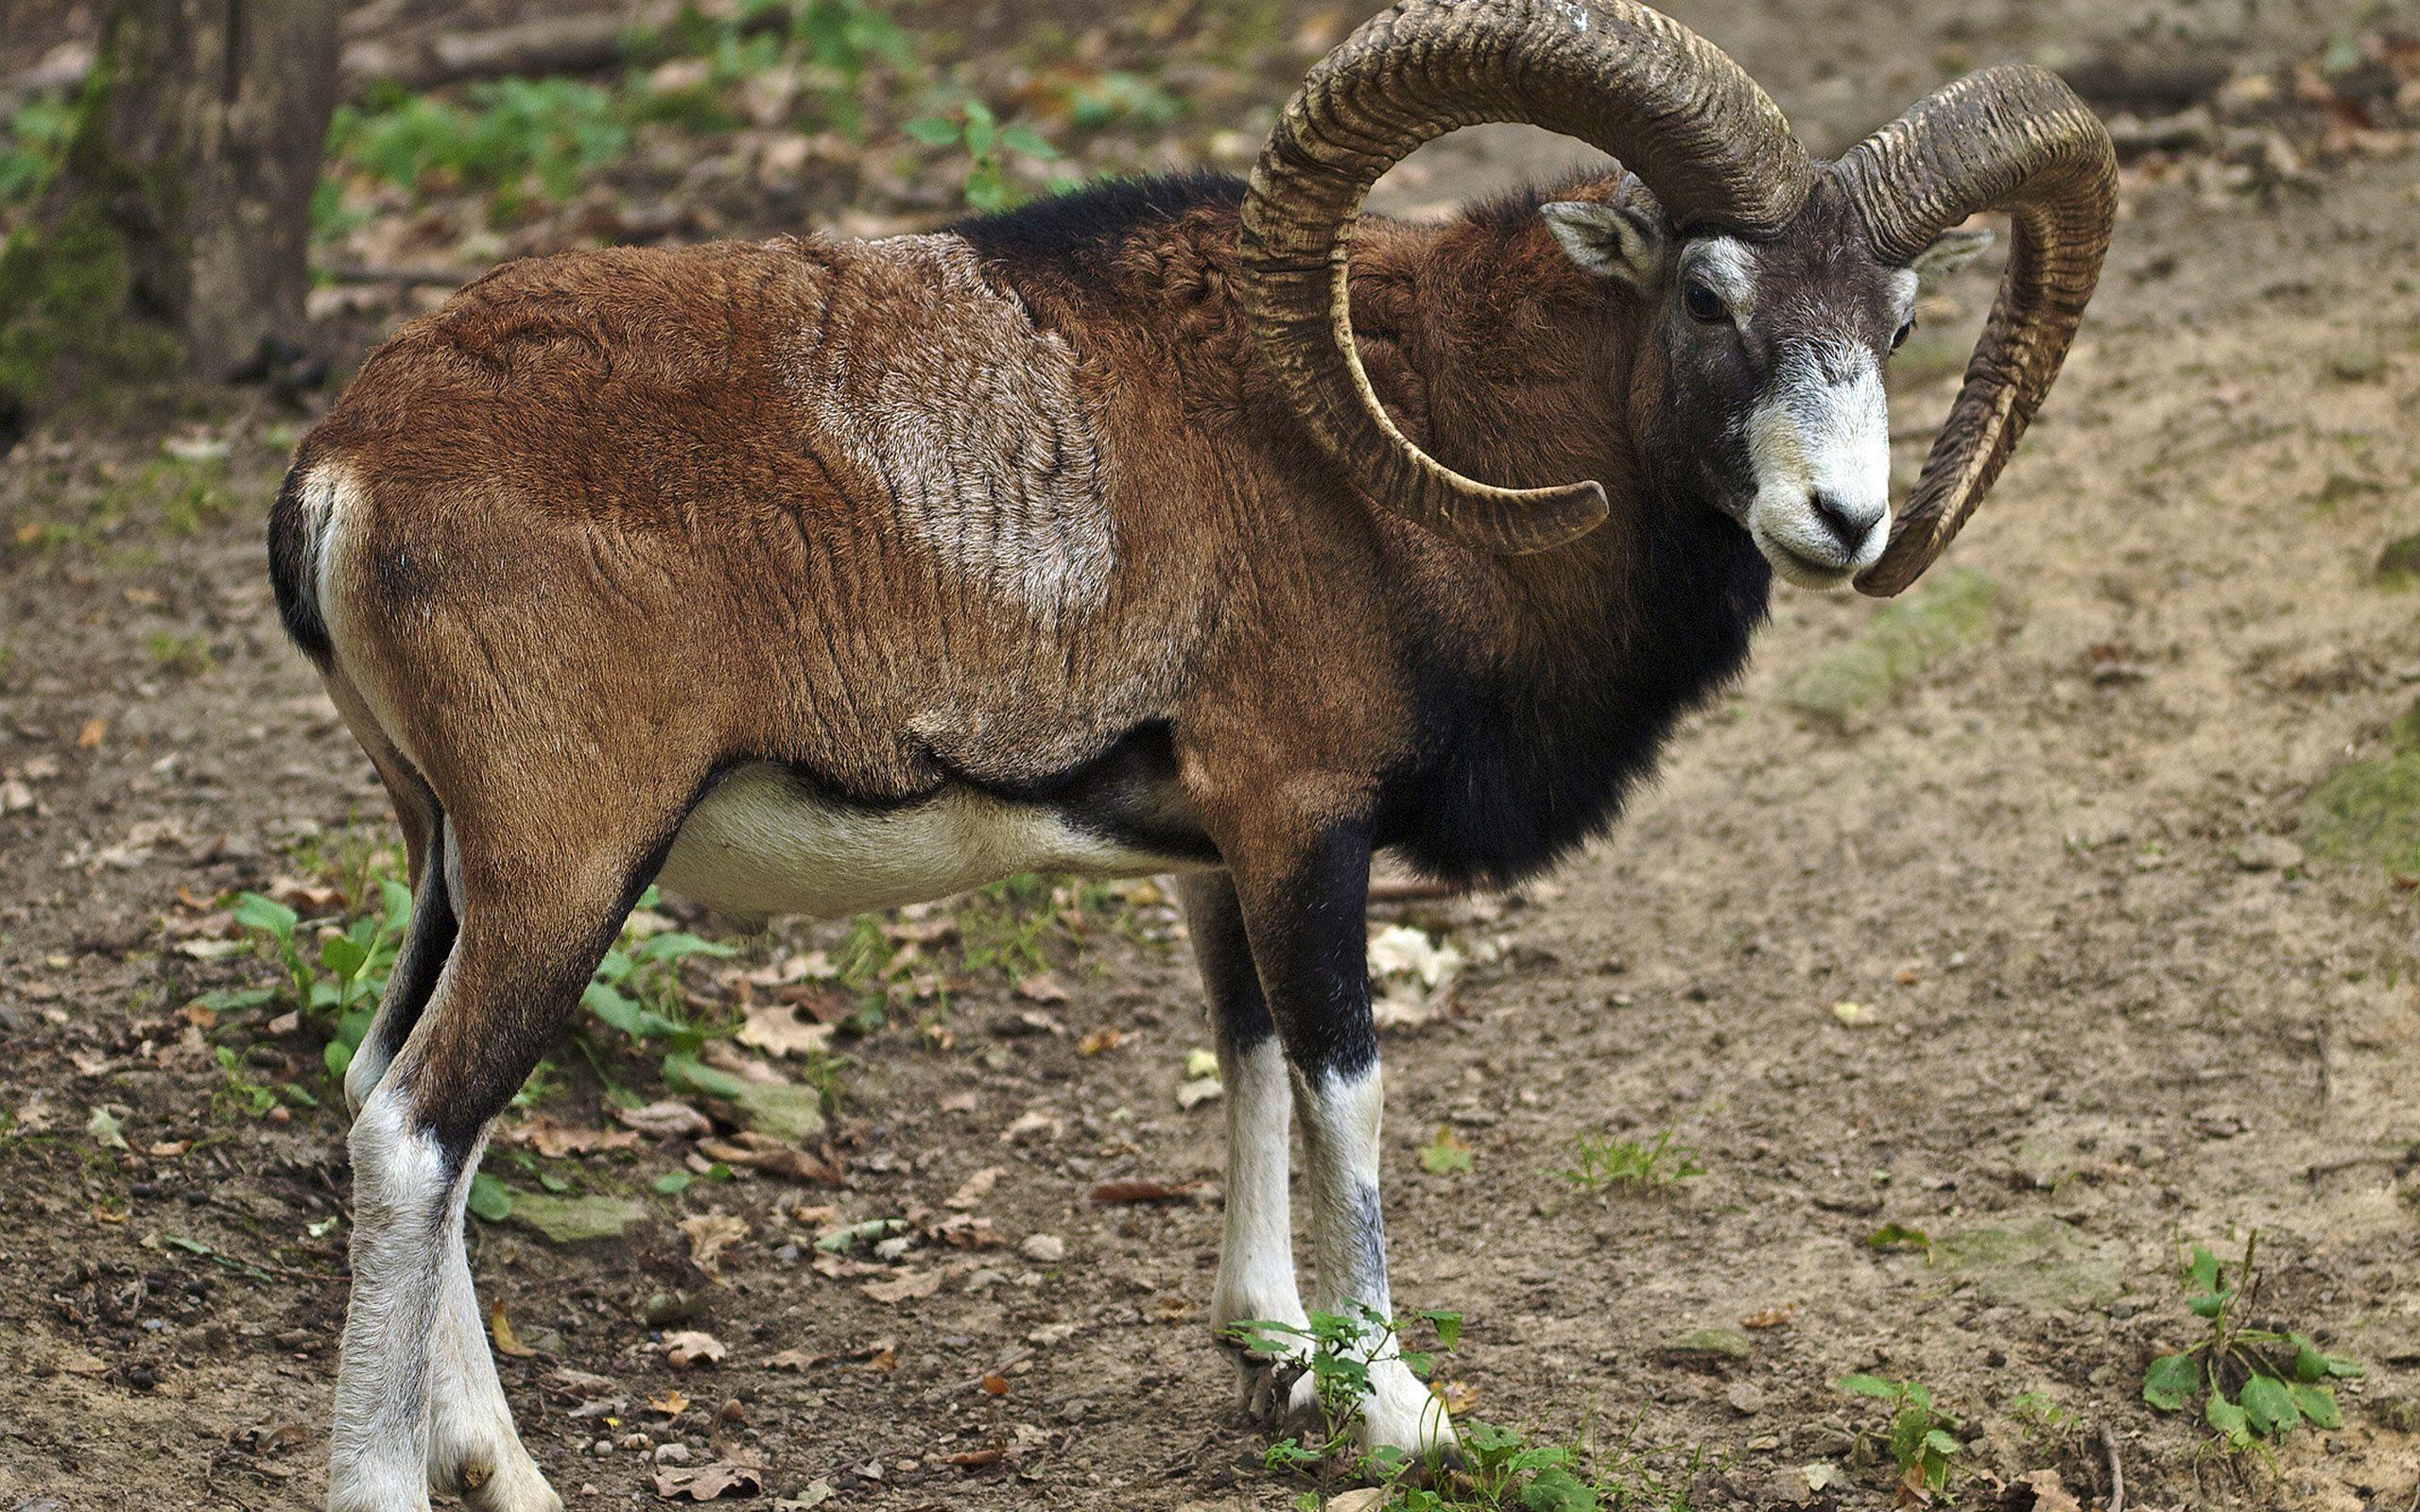 Best 58 Mouflon Wallpaper on HipWallpaper Mouflon Wallpaper 2560x1600